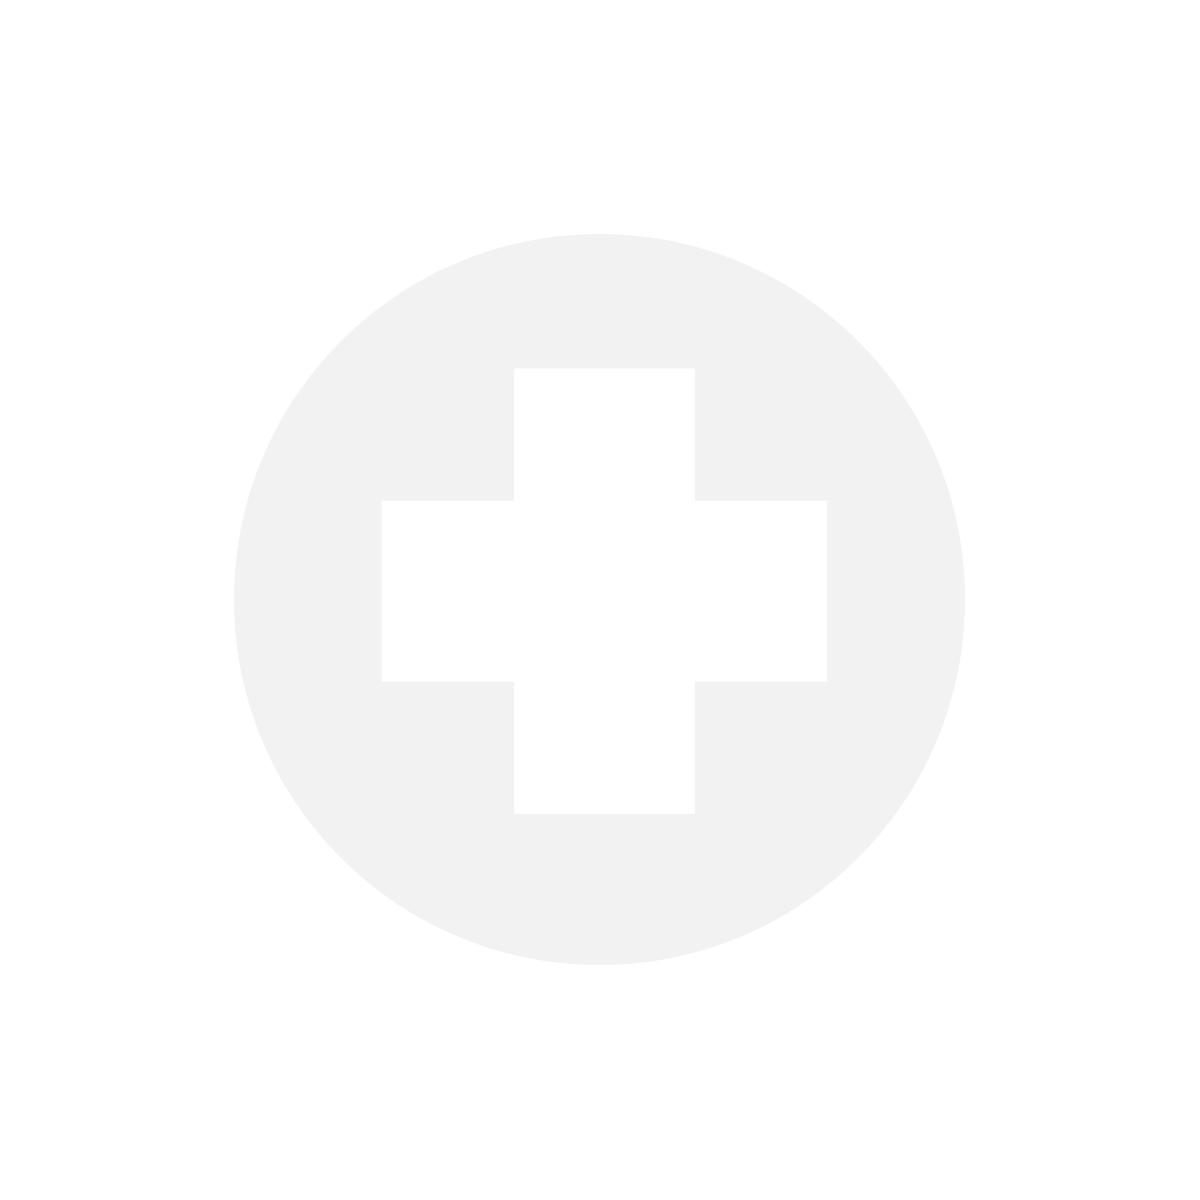 NOVAFON Appareil à infrasons SK2/2 Novafon